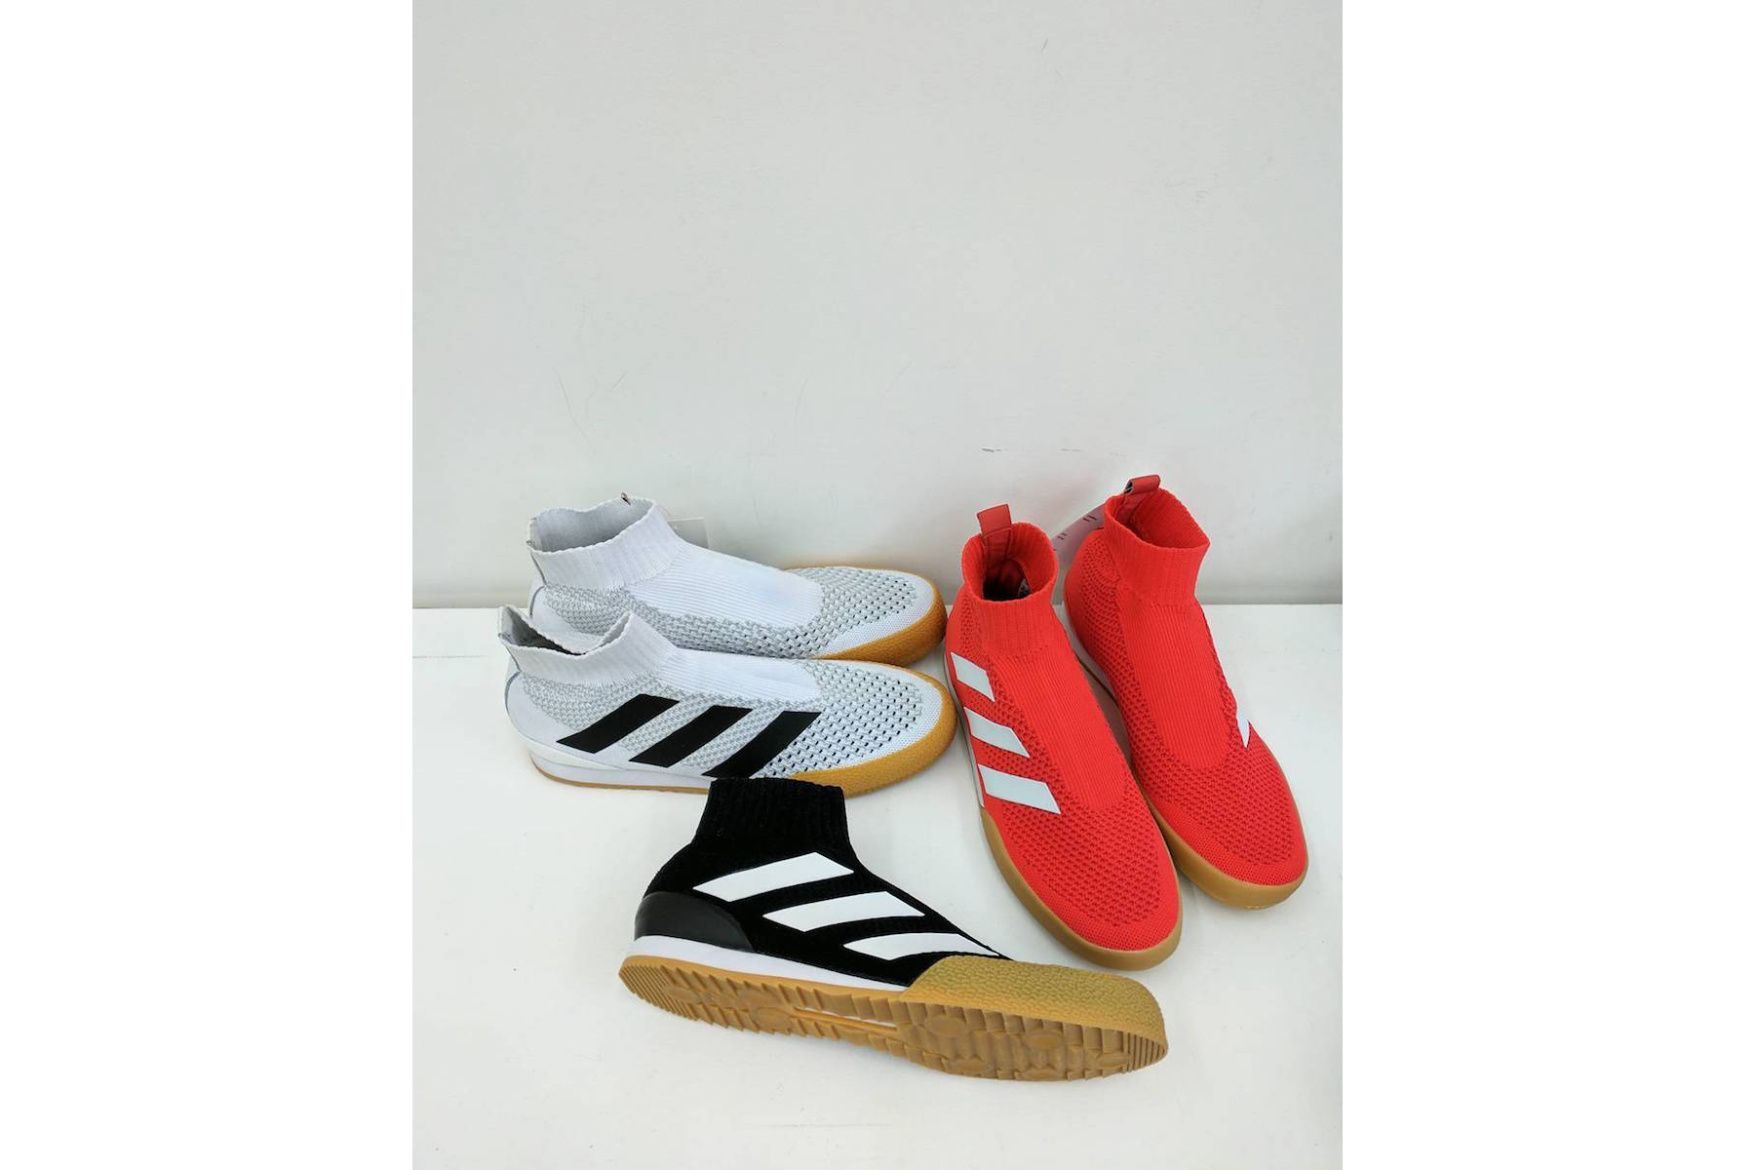 detailed look 7a67b 44eee Gosha Rubchinskiy x adidas Football ACE 16+ Hybrid More Details